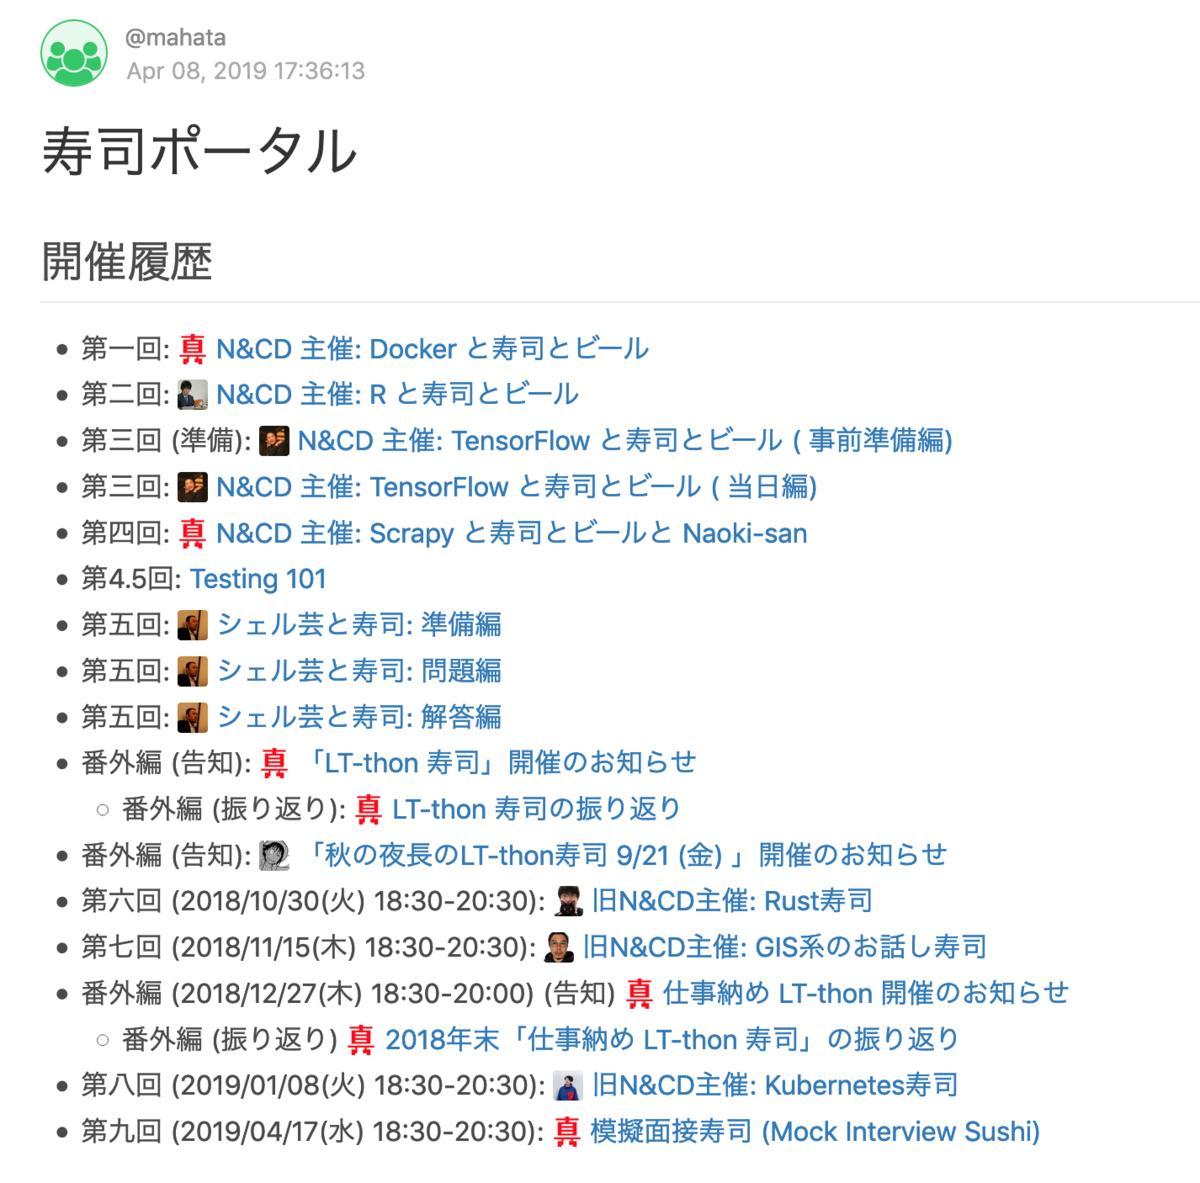 f:id:smartnews_jp:20190510183425p:plain